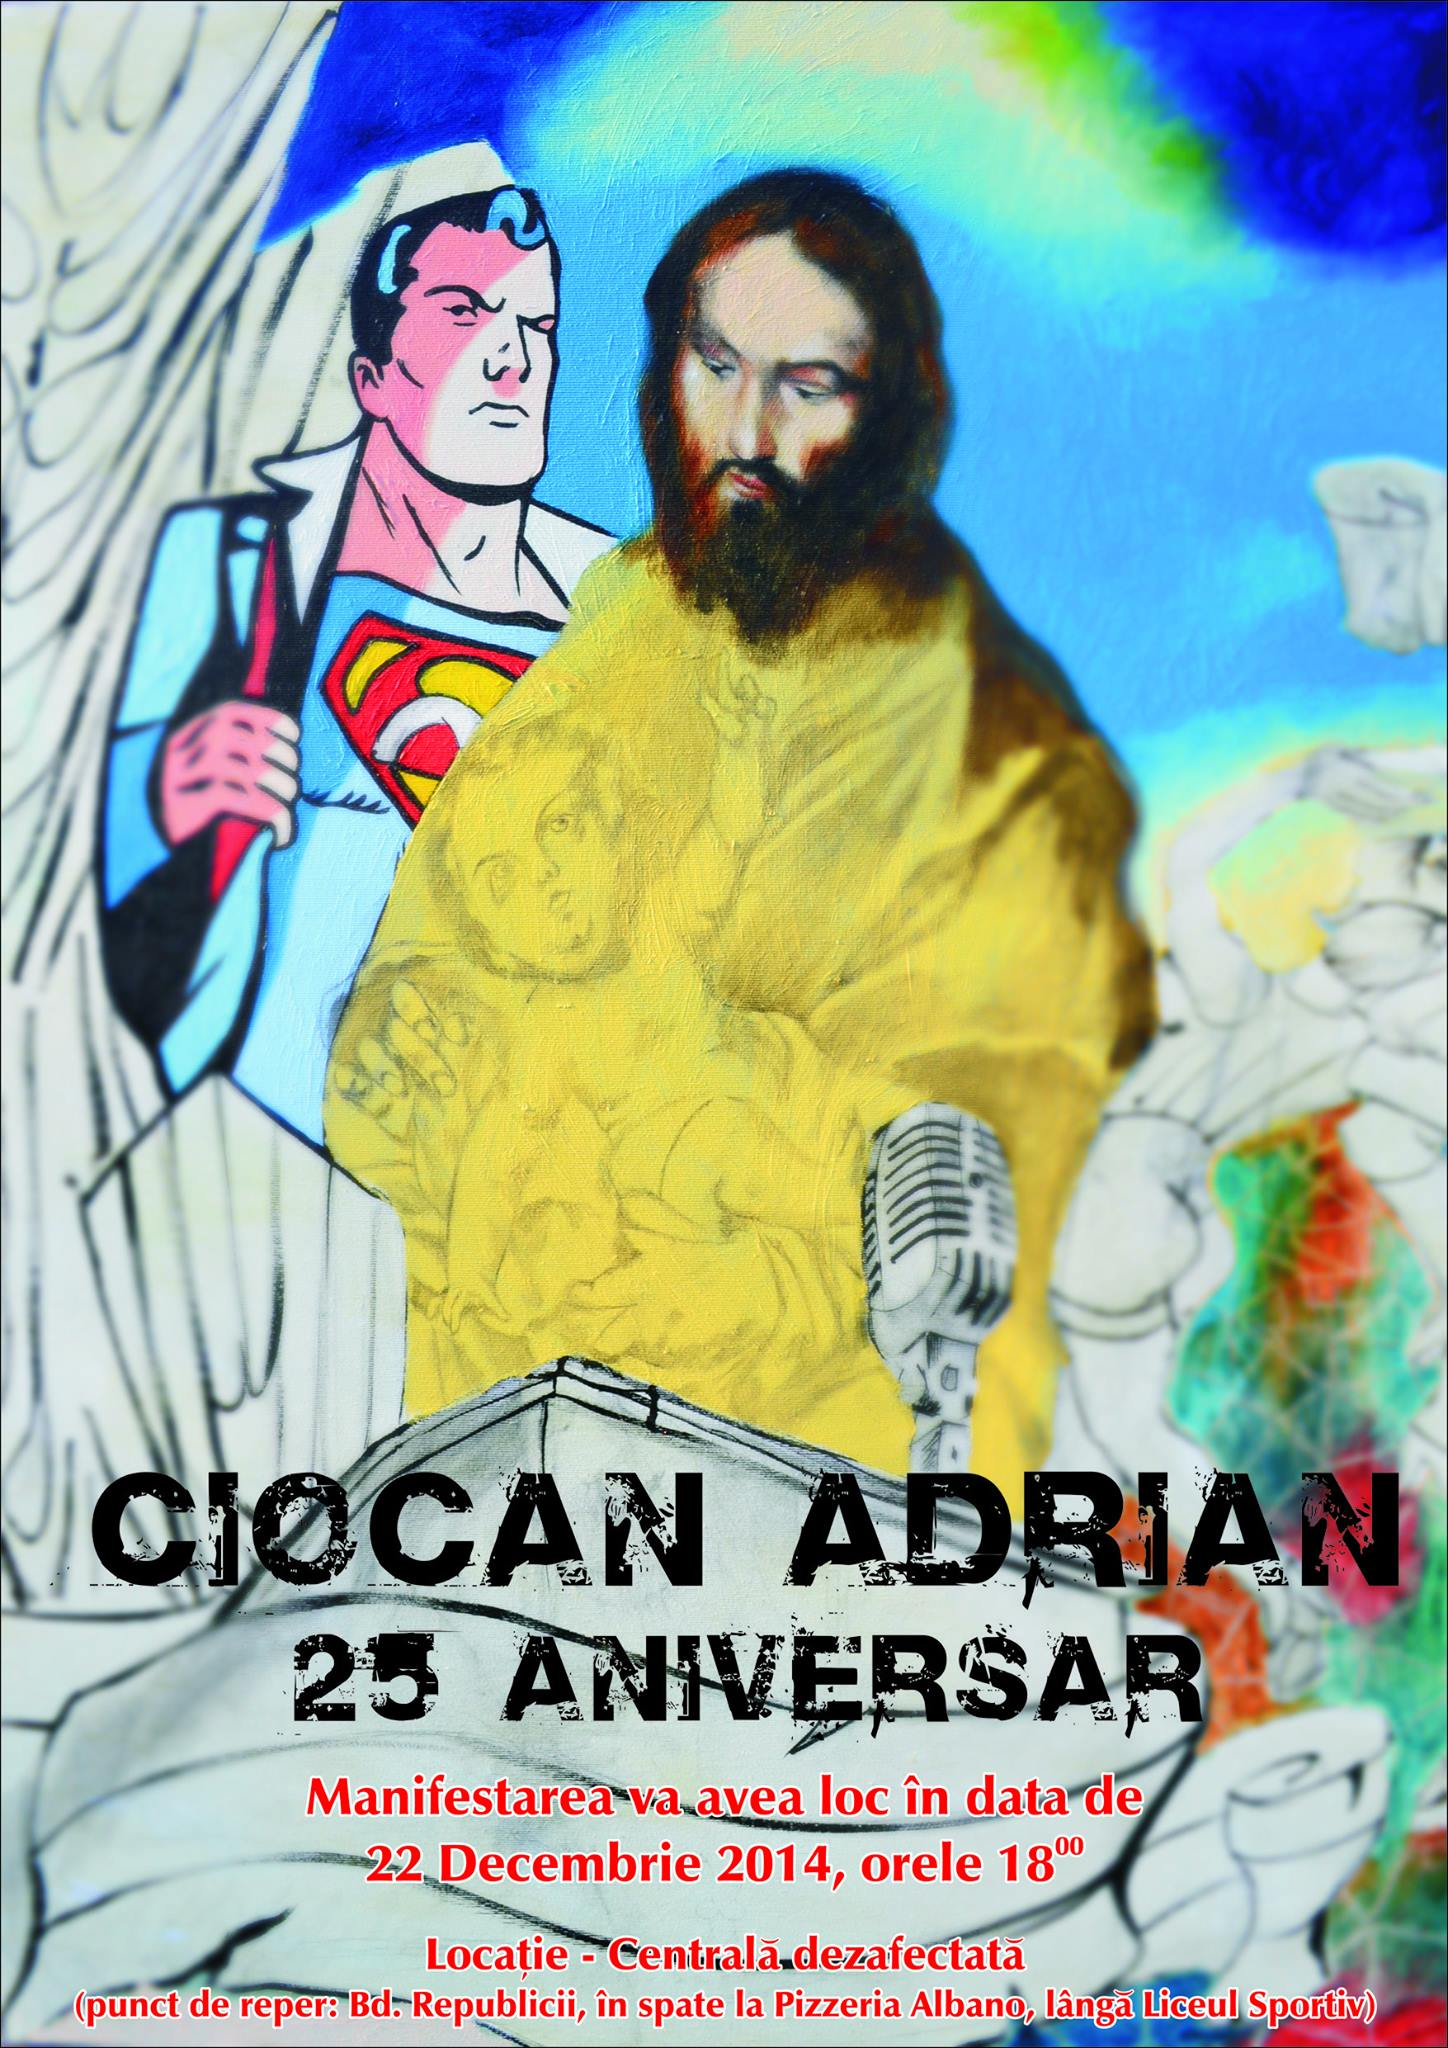 Ciocan Adrian